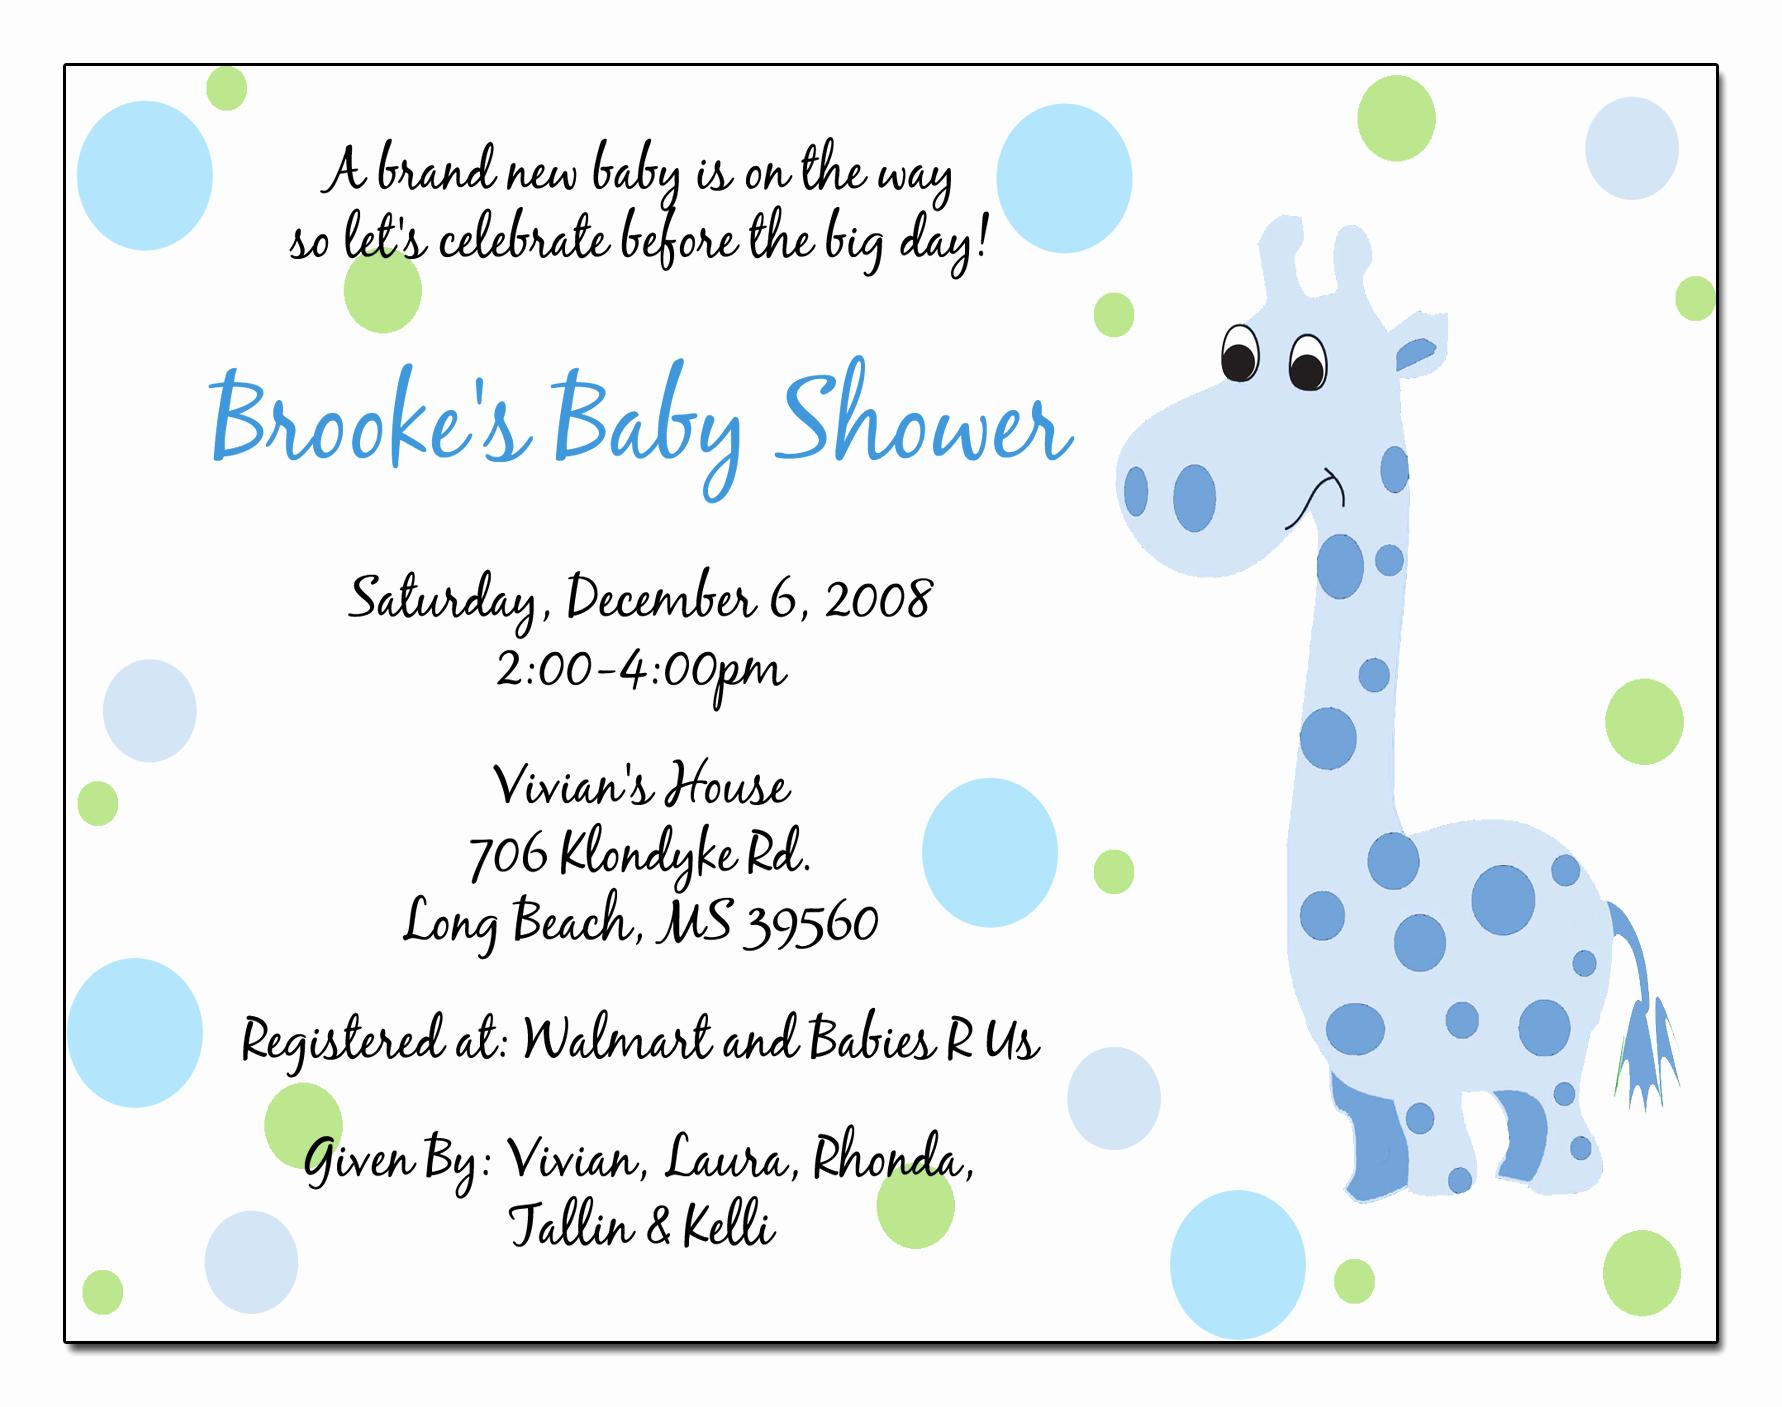 Funny Baby Shower Invitation Wording Unique Baby Boy Shower Invitations Wording Ideas